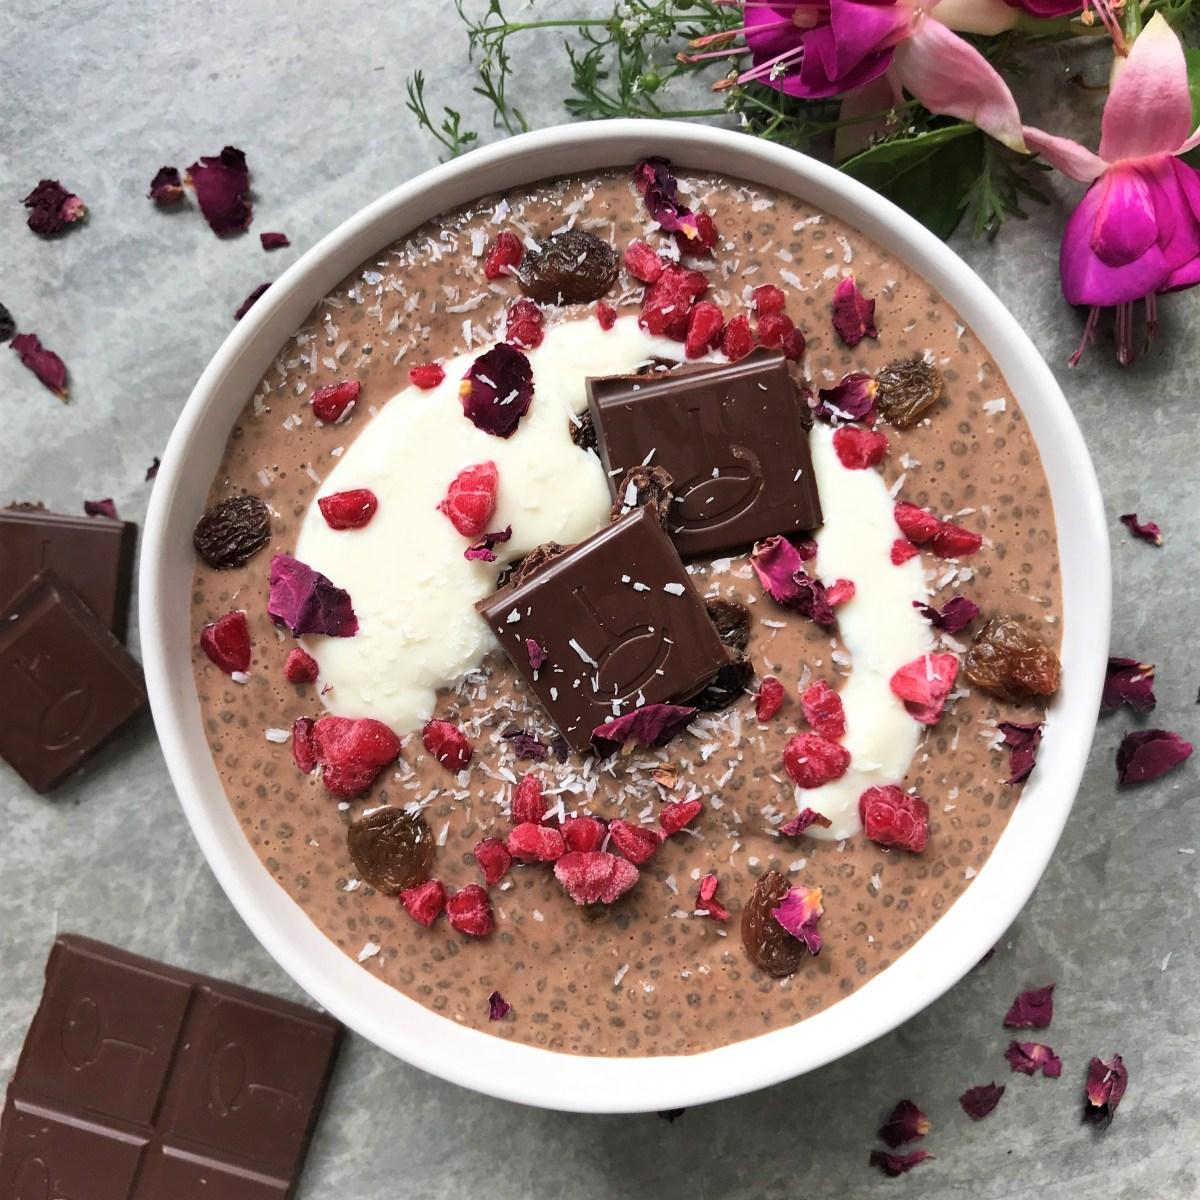 Chocolate Cinnamon and Raisin Chia Pudding